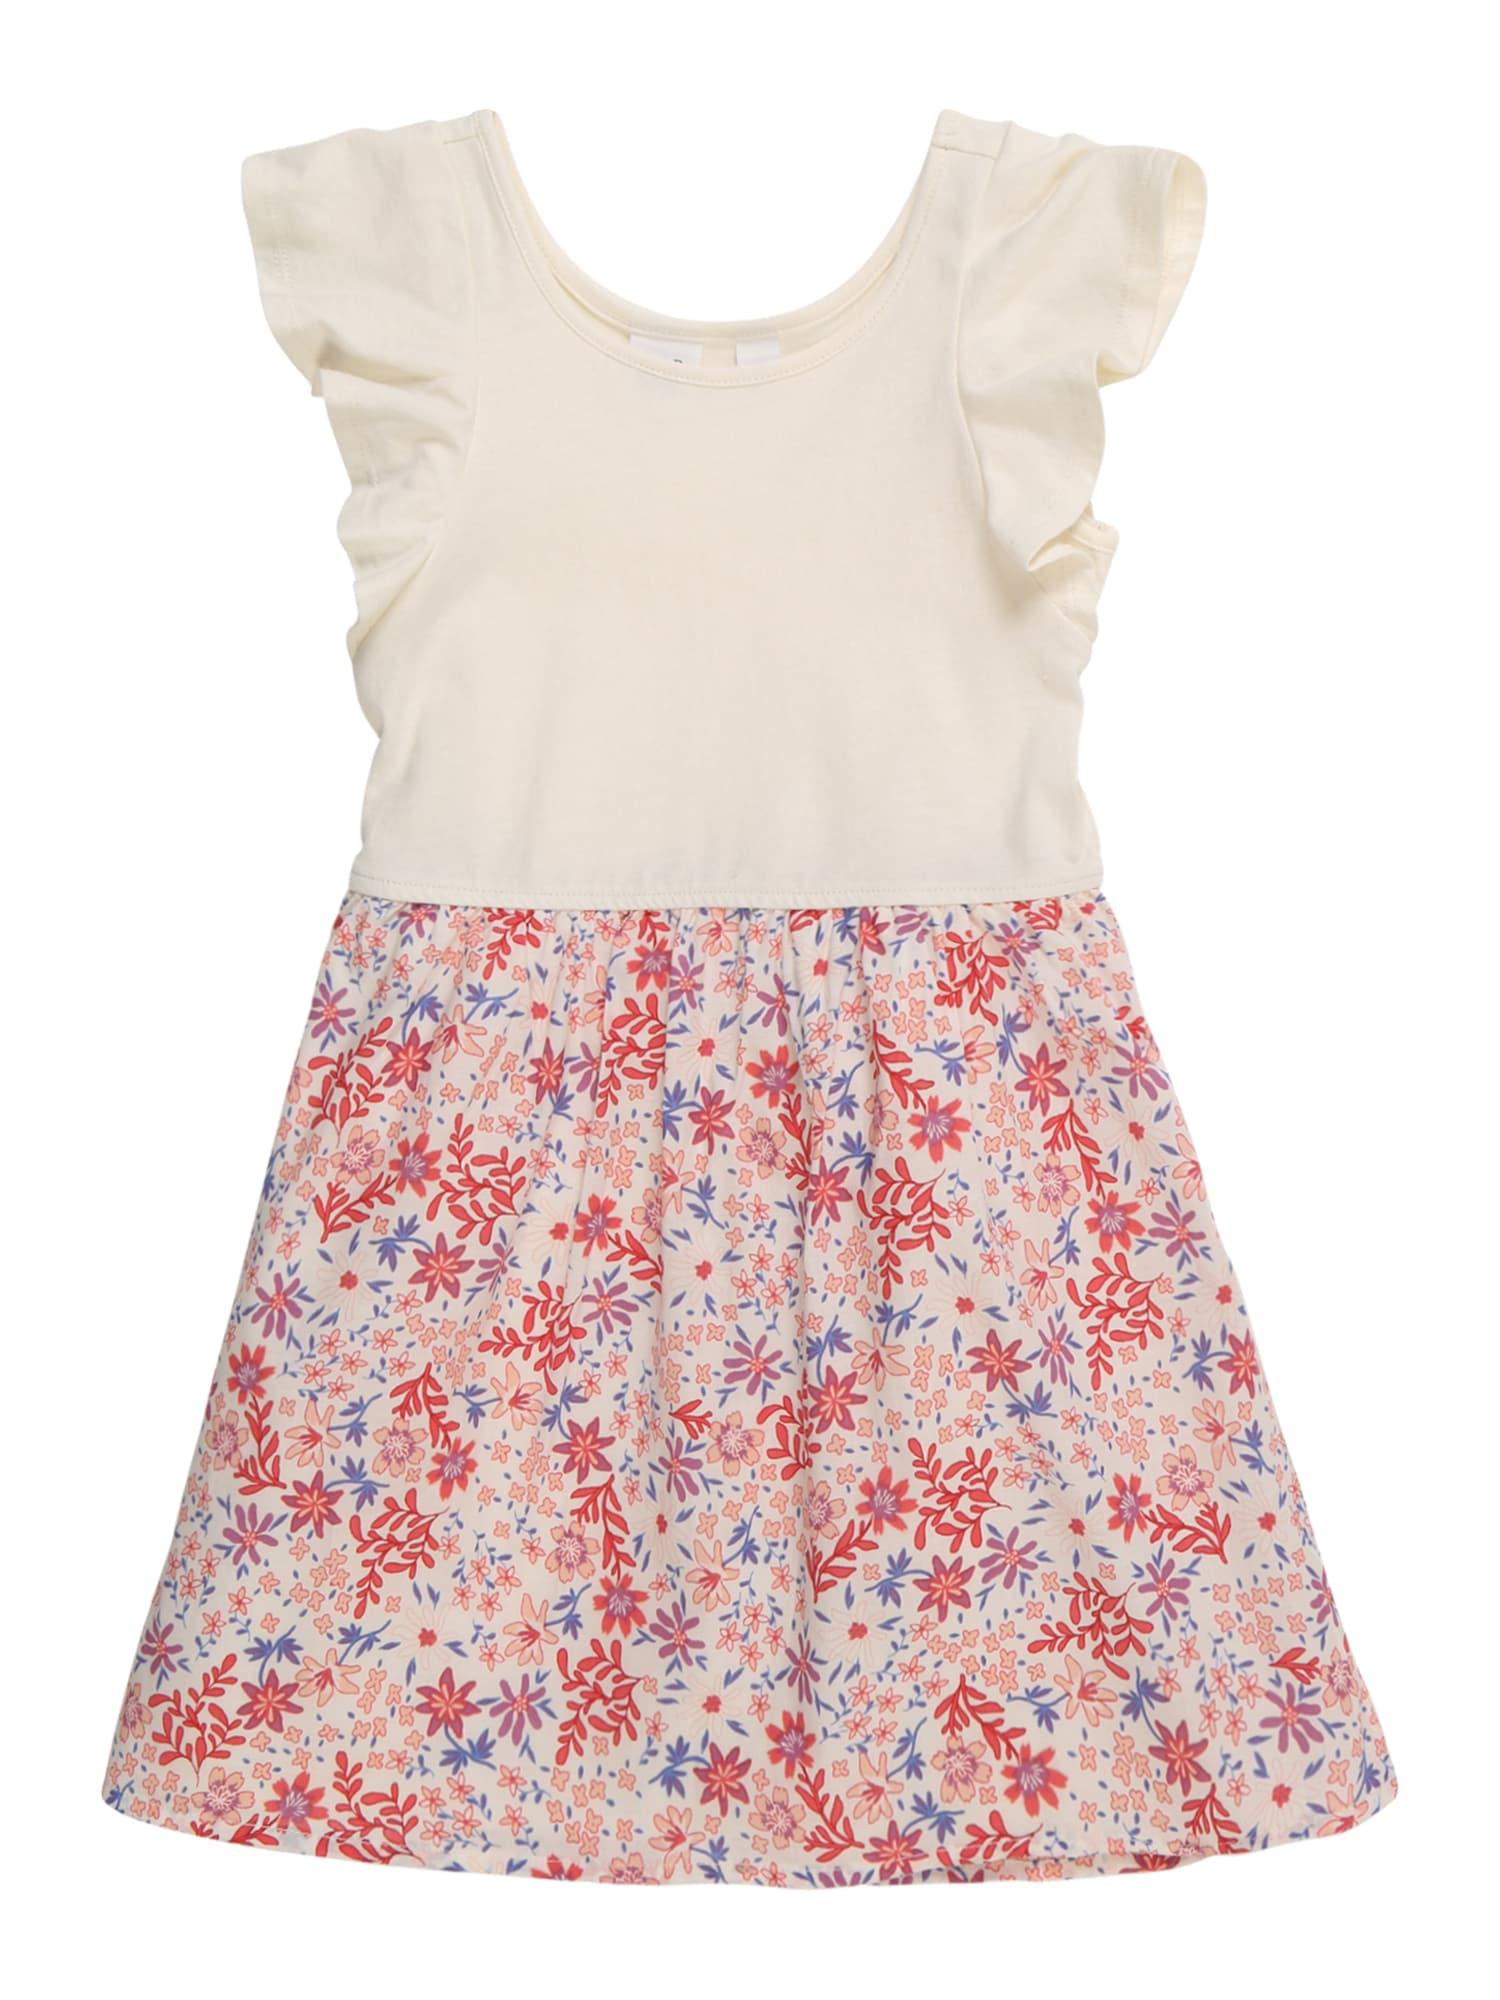 Šaty růžová barva bílé vlny GAP